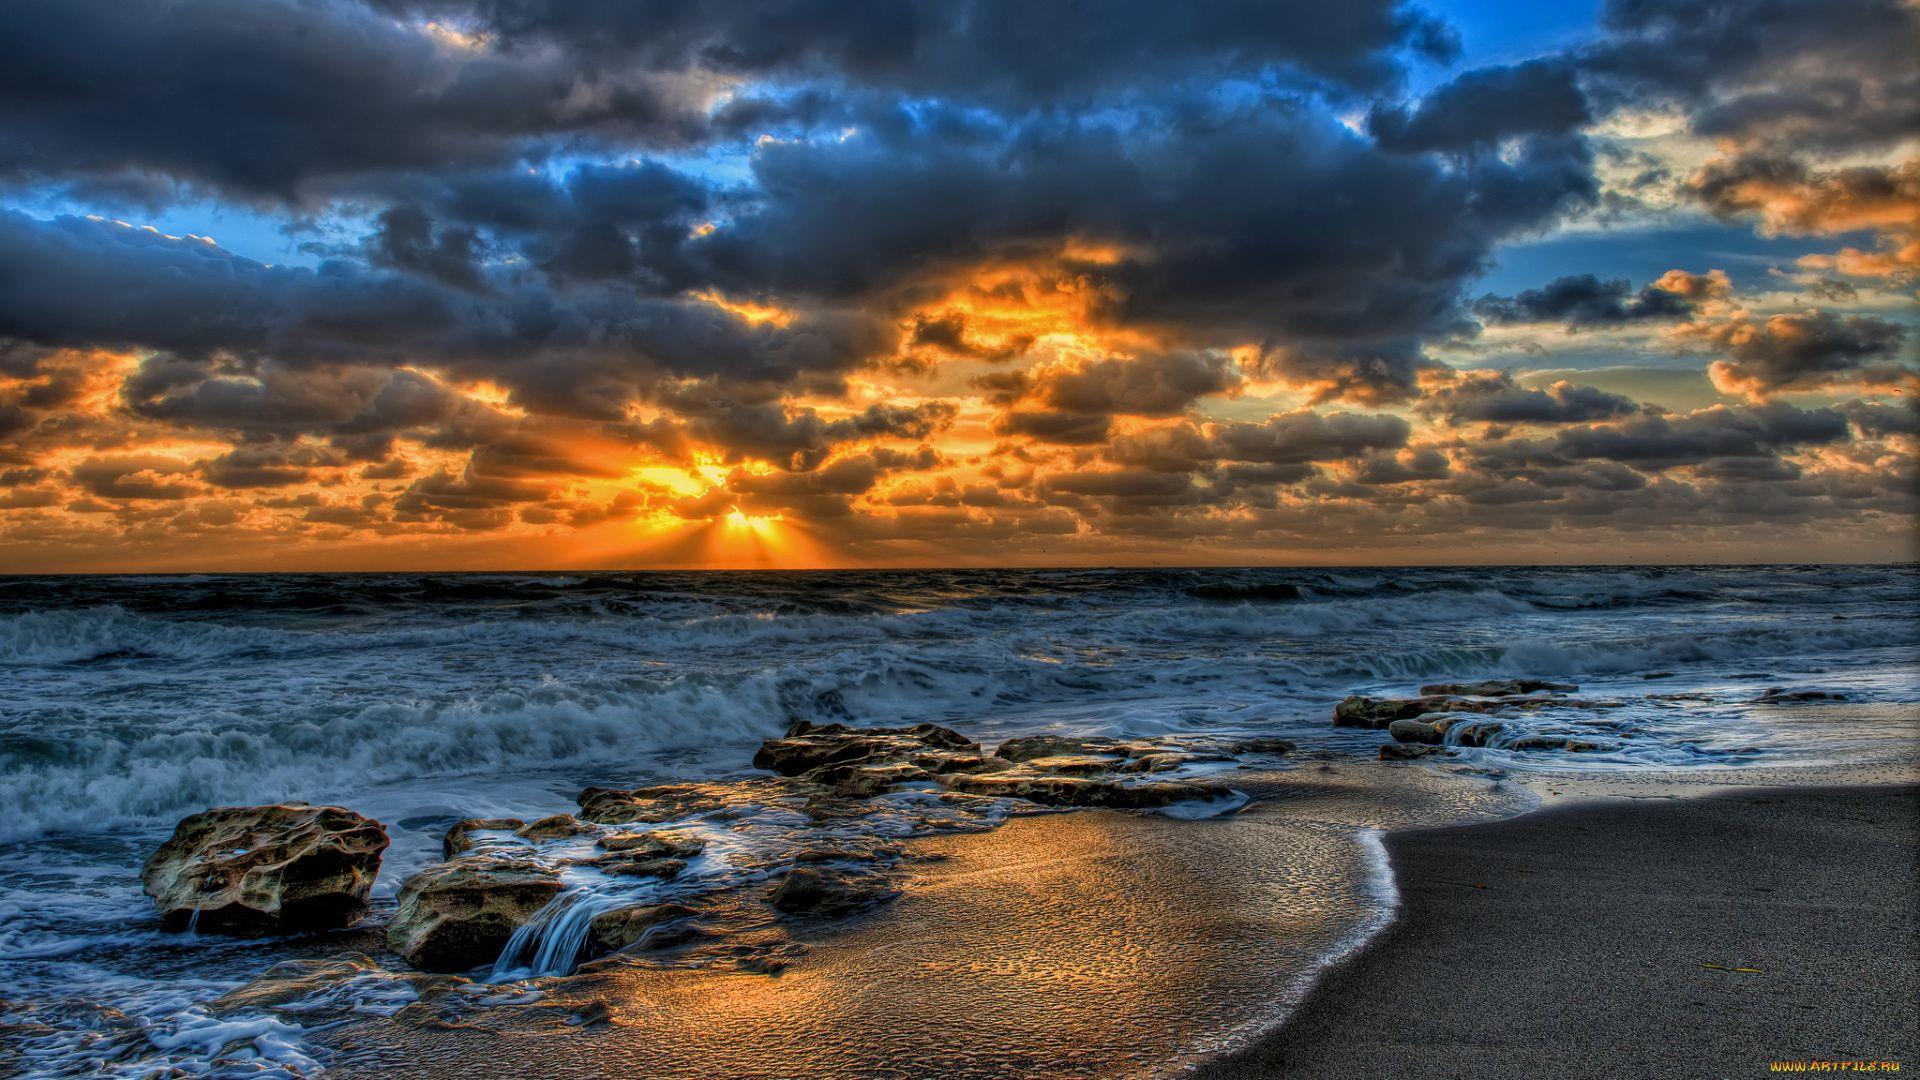 Ocean Sunset beautiful wallpaper